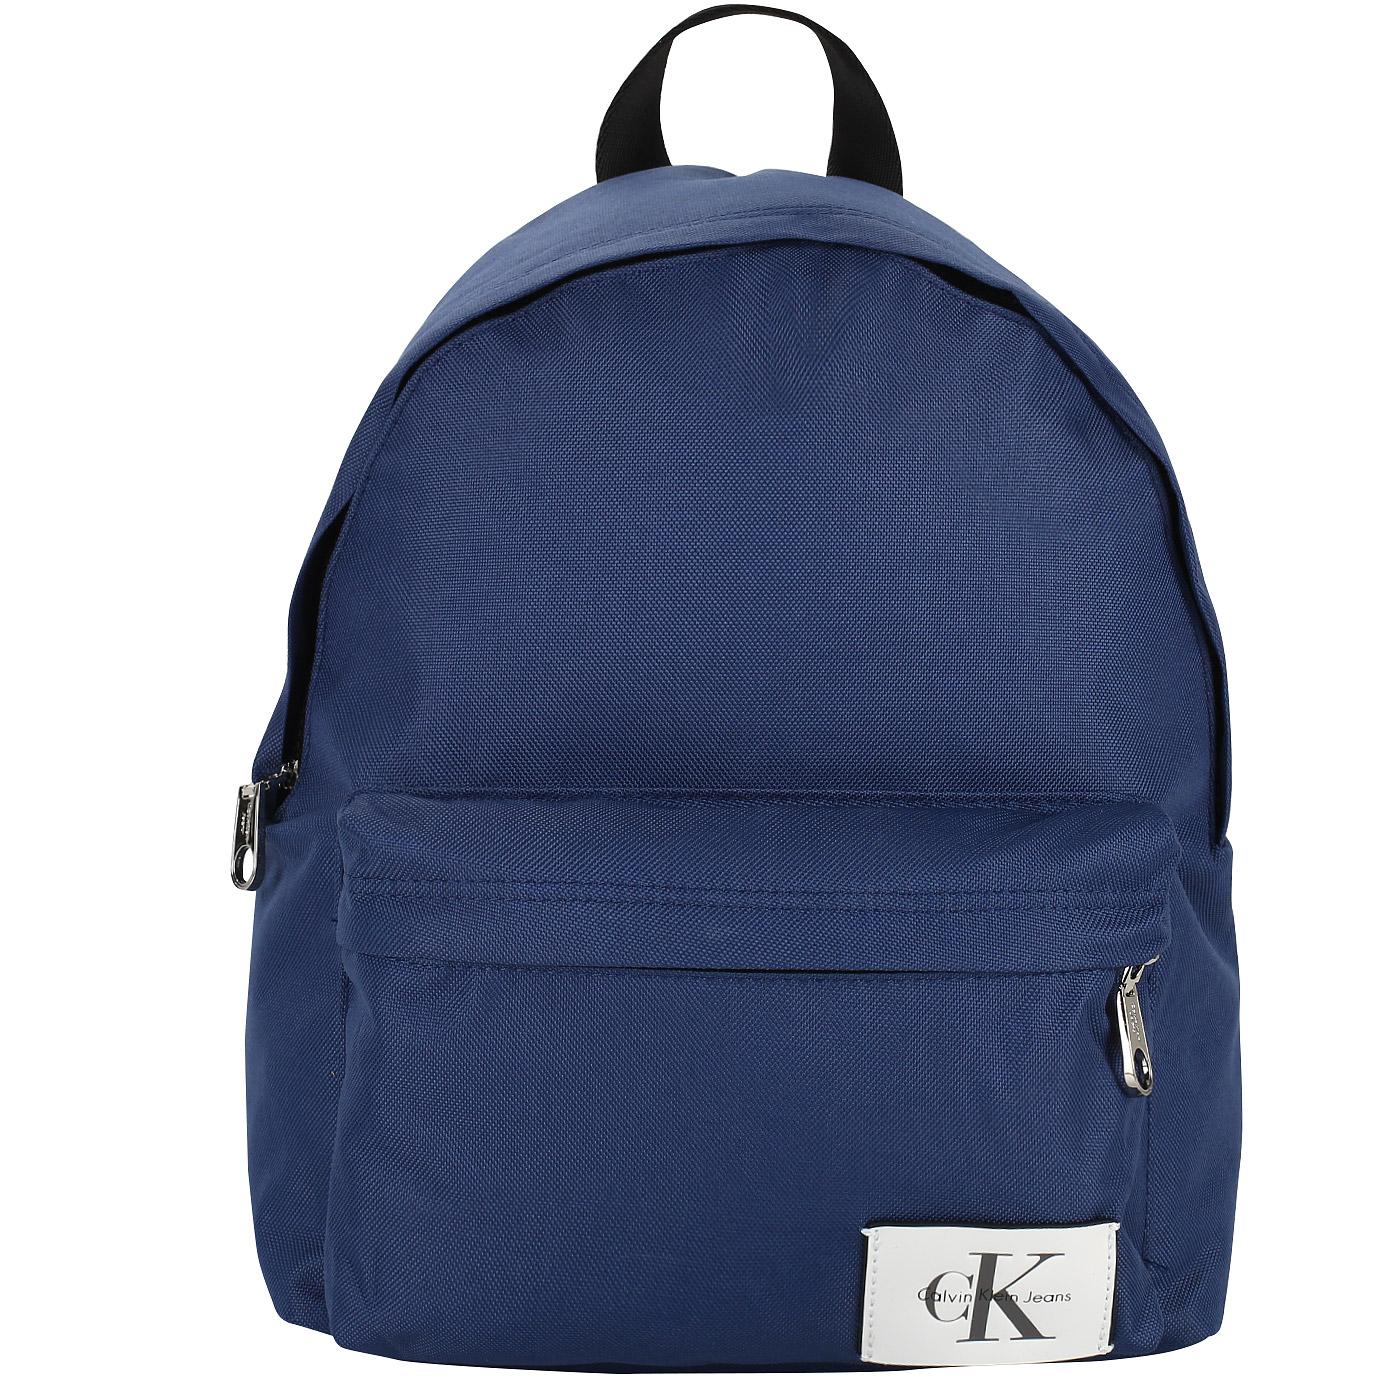 70ae24d7a32c ... Мужской городской рюкзак Calvin Klein Jeans Sport Essential ...